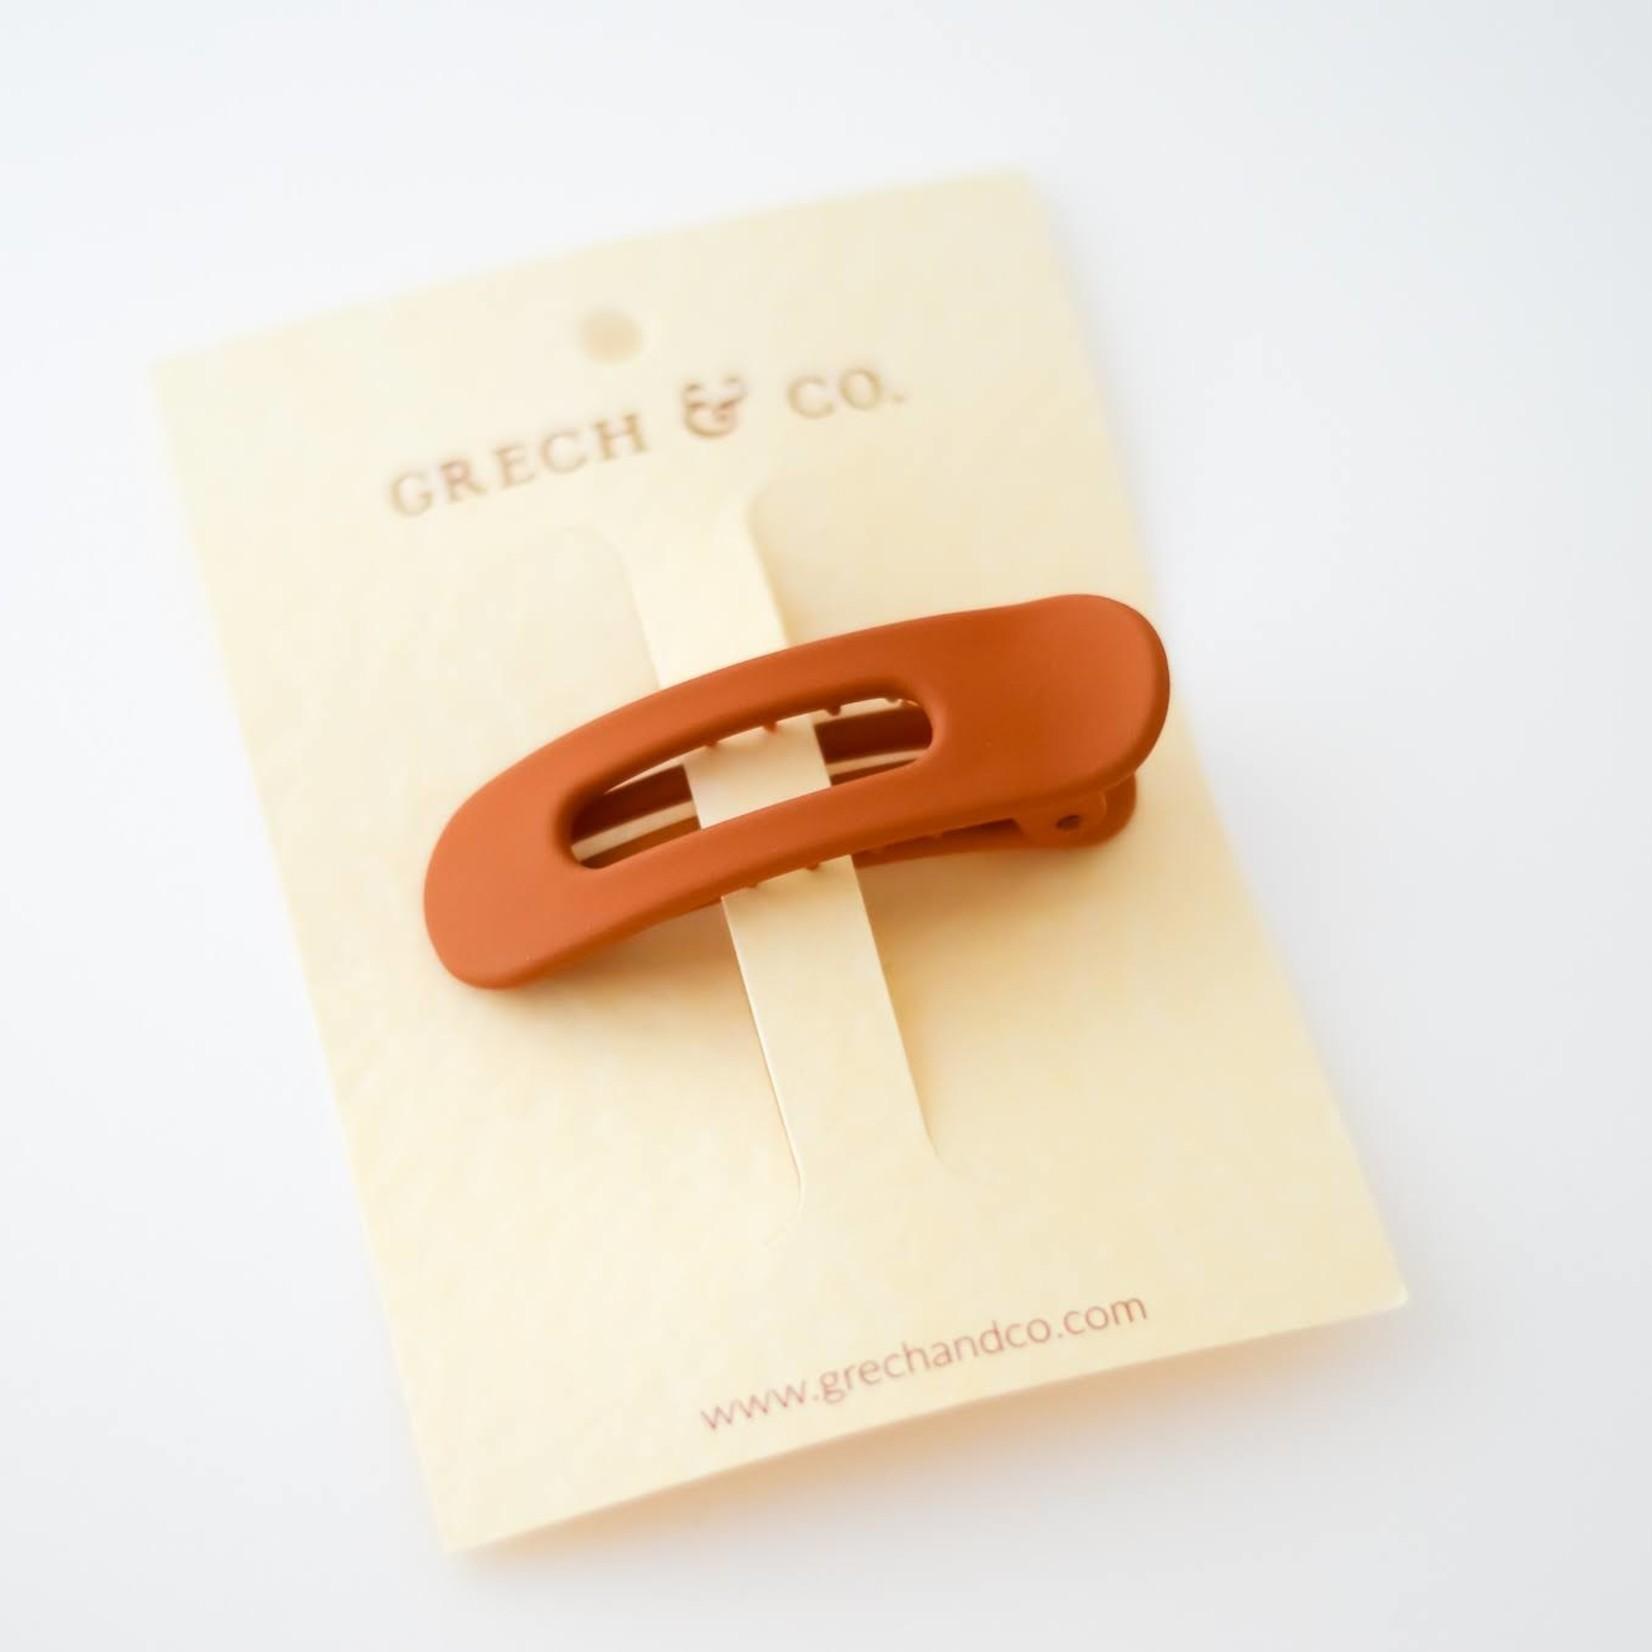 Grech & Co Grech & Co   Grip Clips - Spice